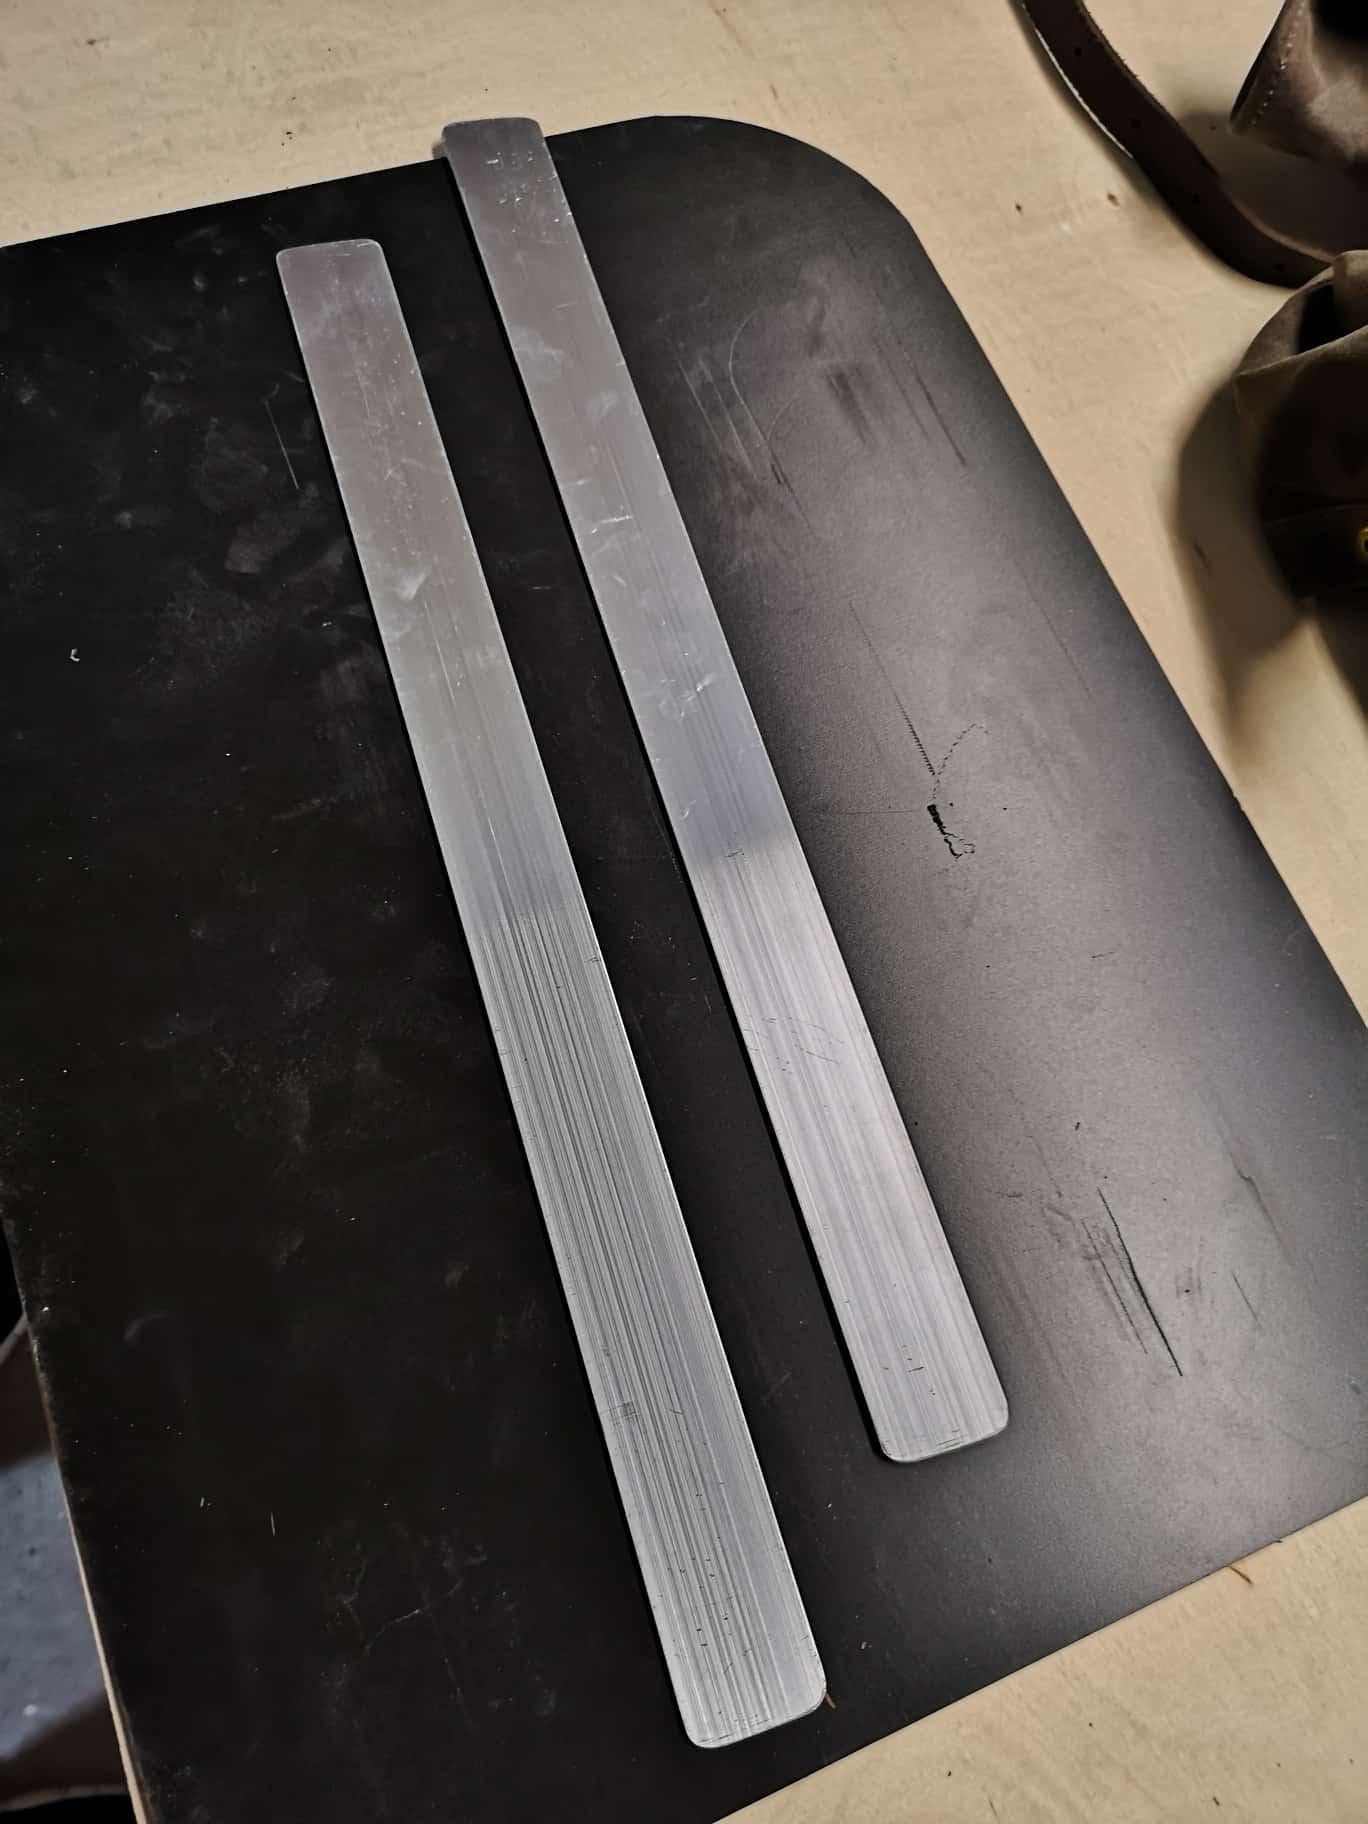 Naturbursche - Frost River Isle Royale - Backpalte - Rückenplatte - Back Cover - Rahmen - Frame - Internal - Howto - DIY - MYOG